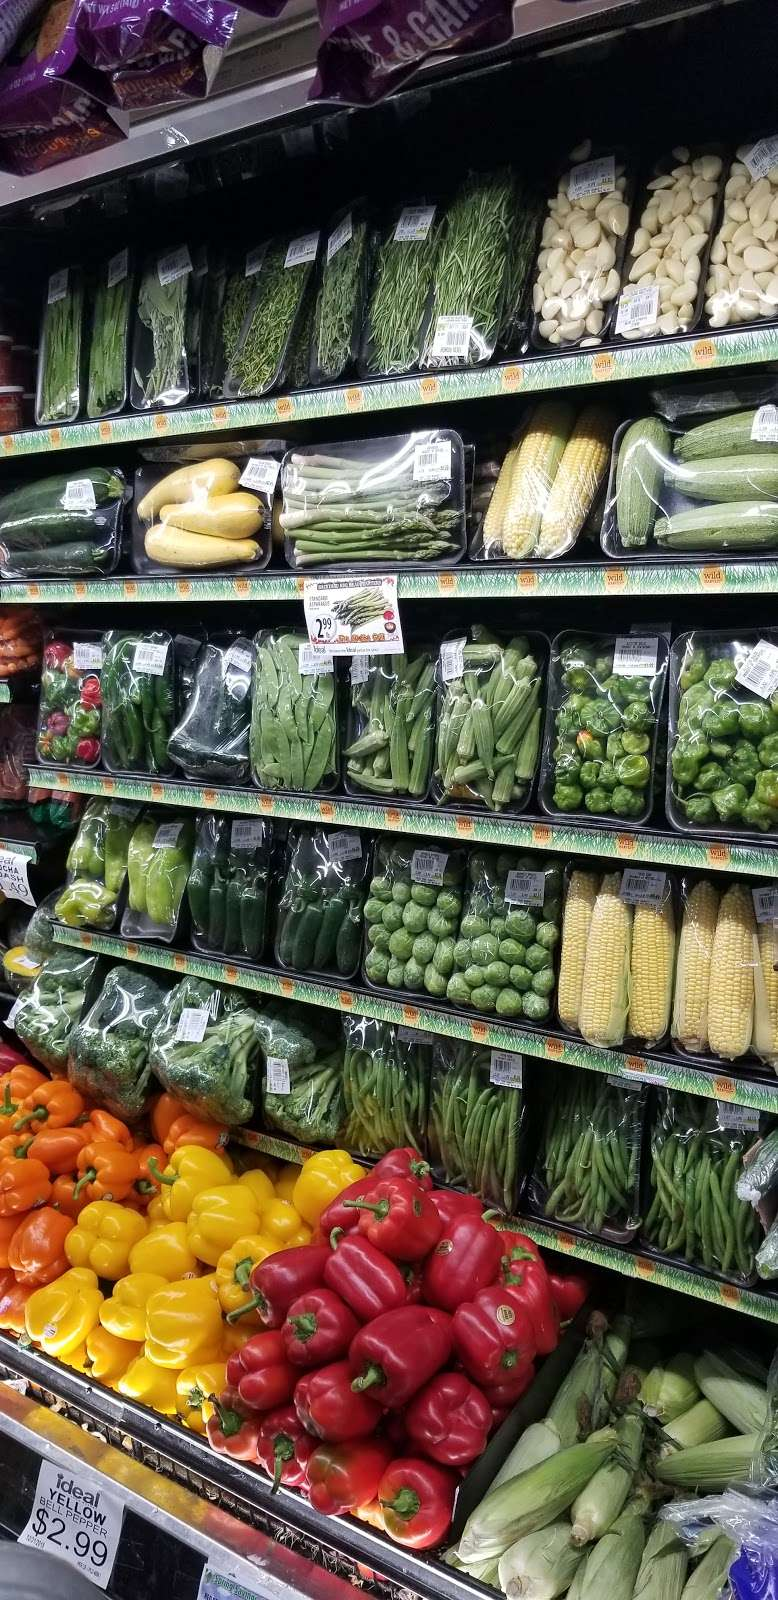 Ideal Food Basket - supermarket  | Photo 6 of 10 | Address: 631 Gates Ave, Brooklyn, NY 11221, USA | Phone: (718) 453-6032